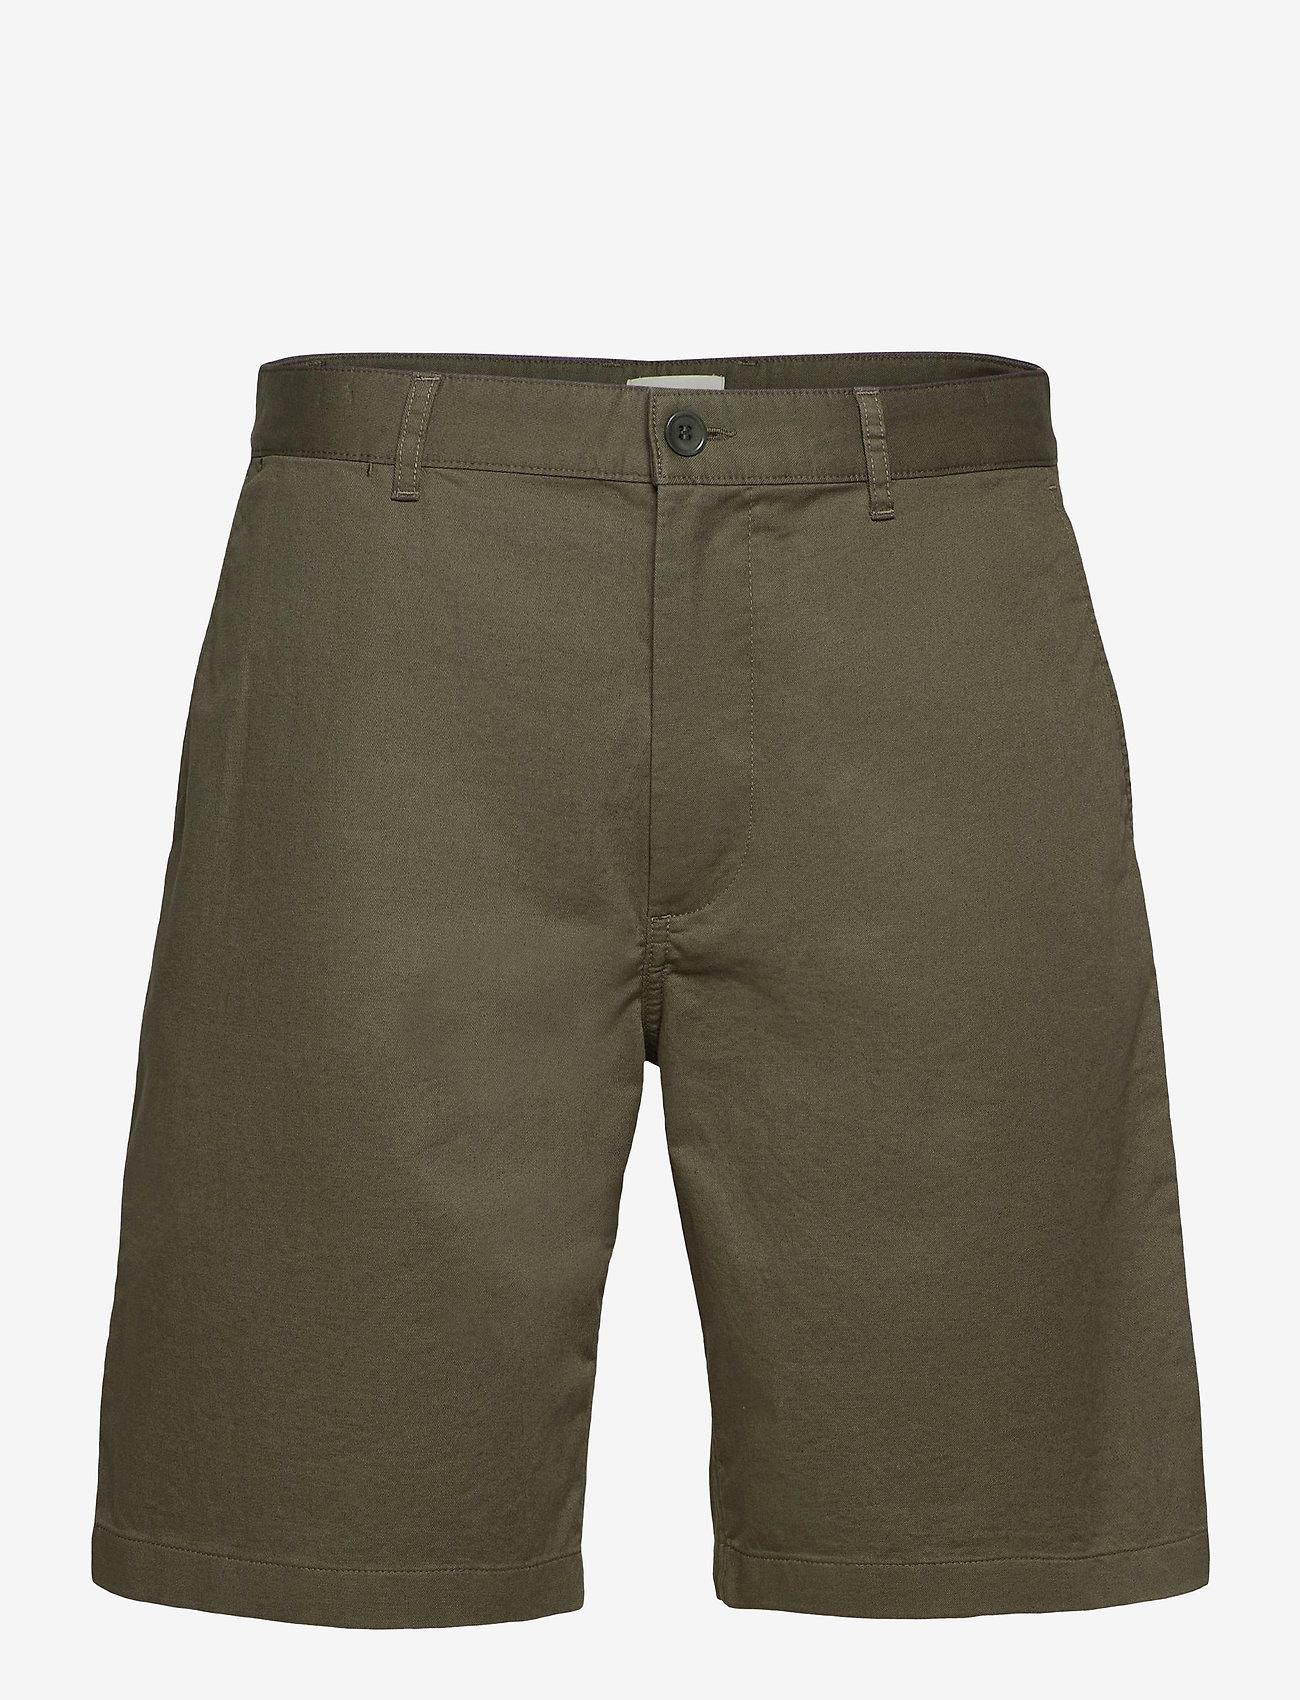 Wood Wood - Jonathan light twill shorts - chino's shorts - olive - 0